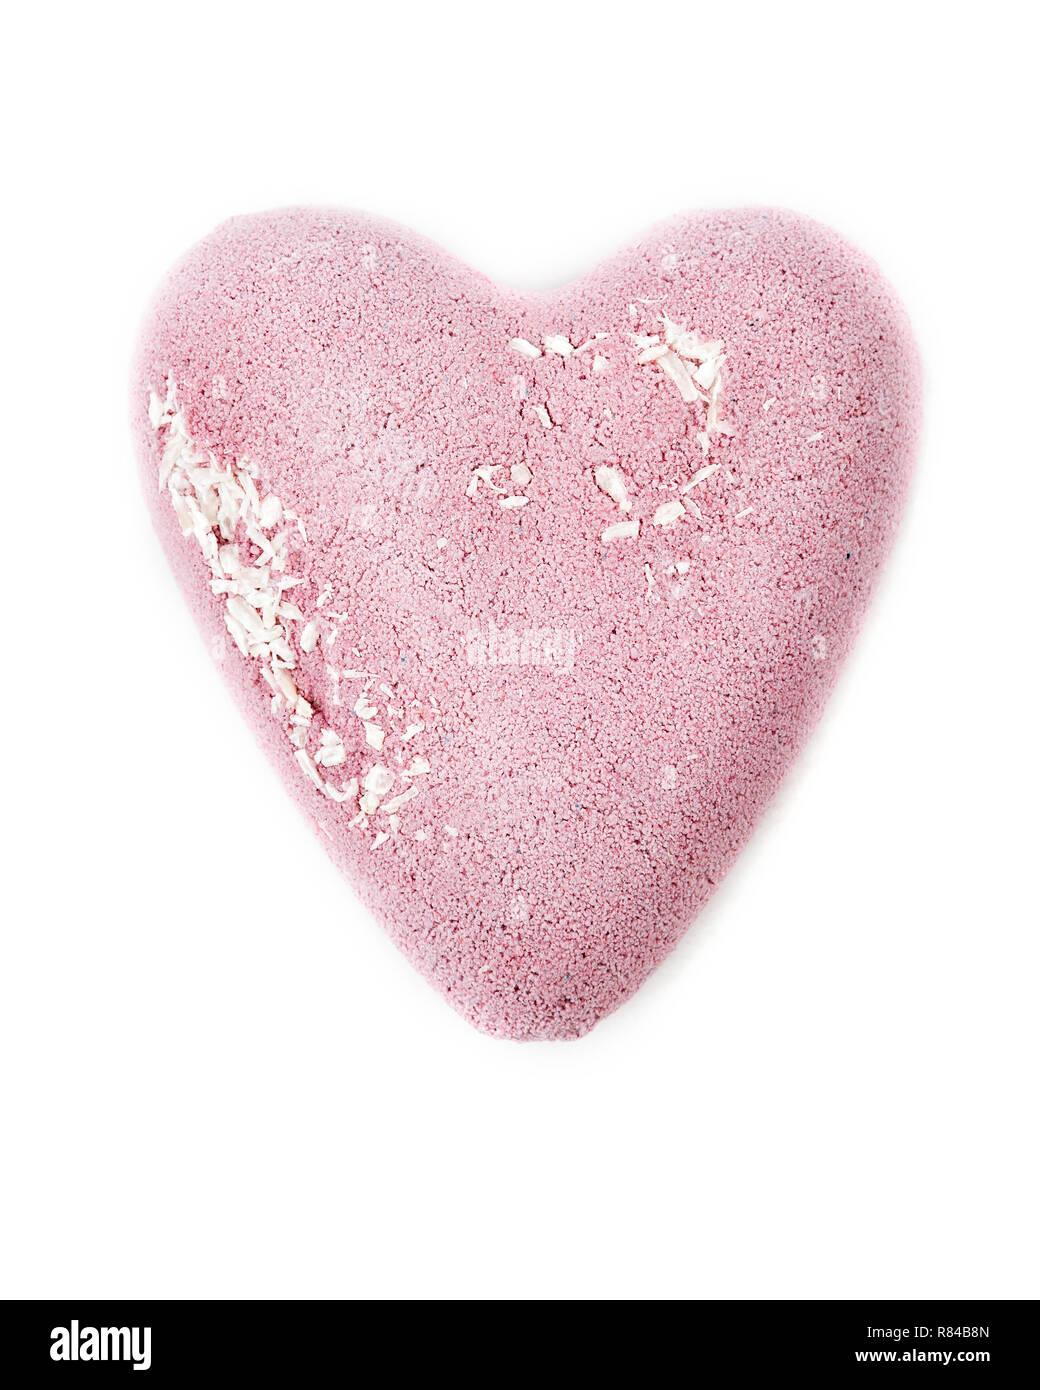 Heart shaped bath bomb on the white background - Stock Image